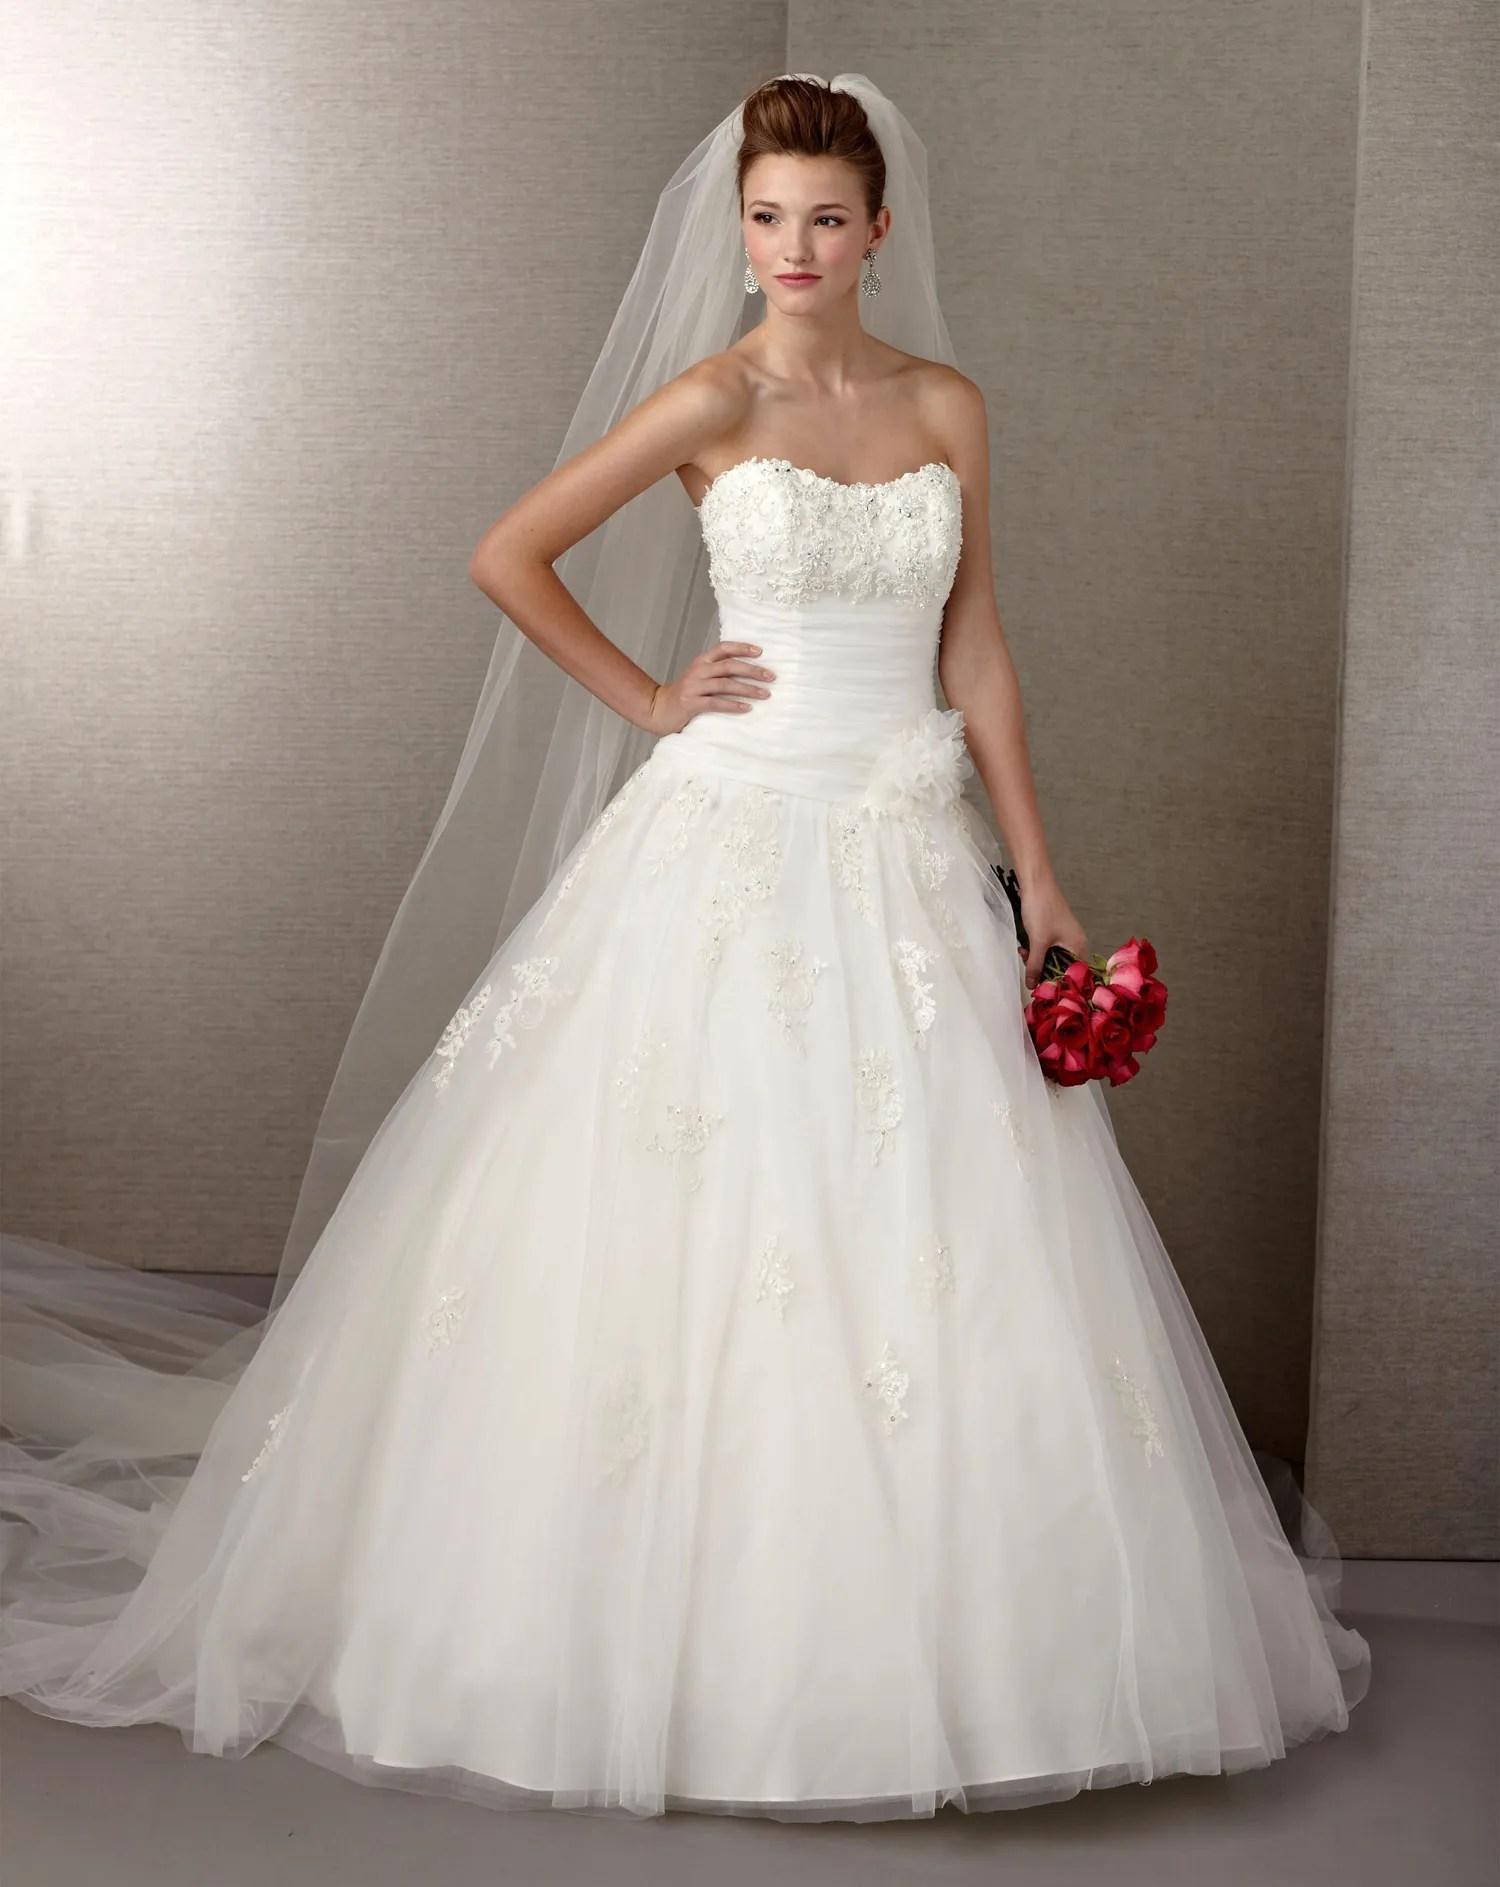 21 gorgeous wedding dresses